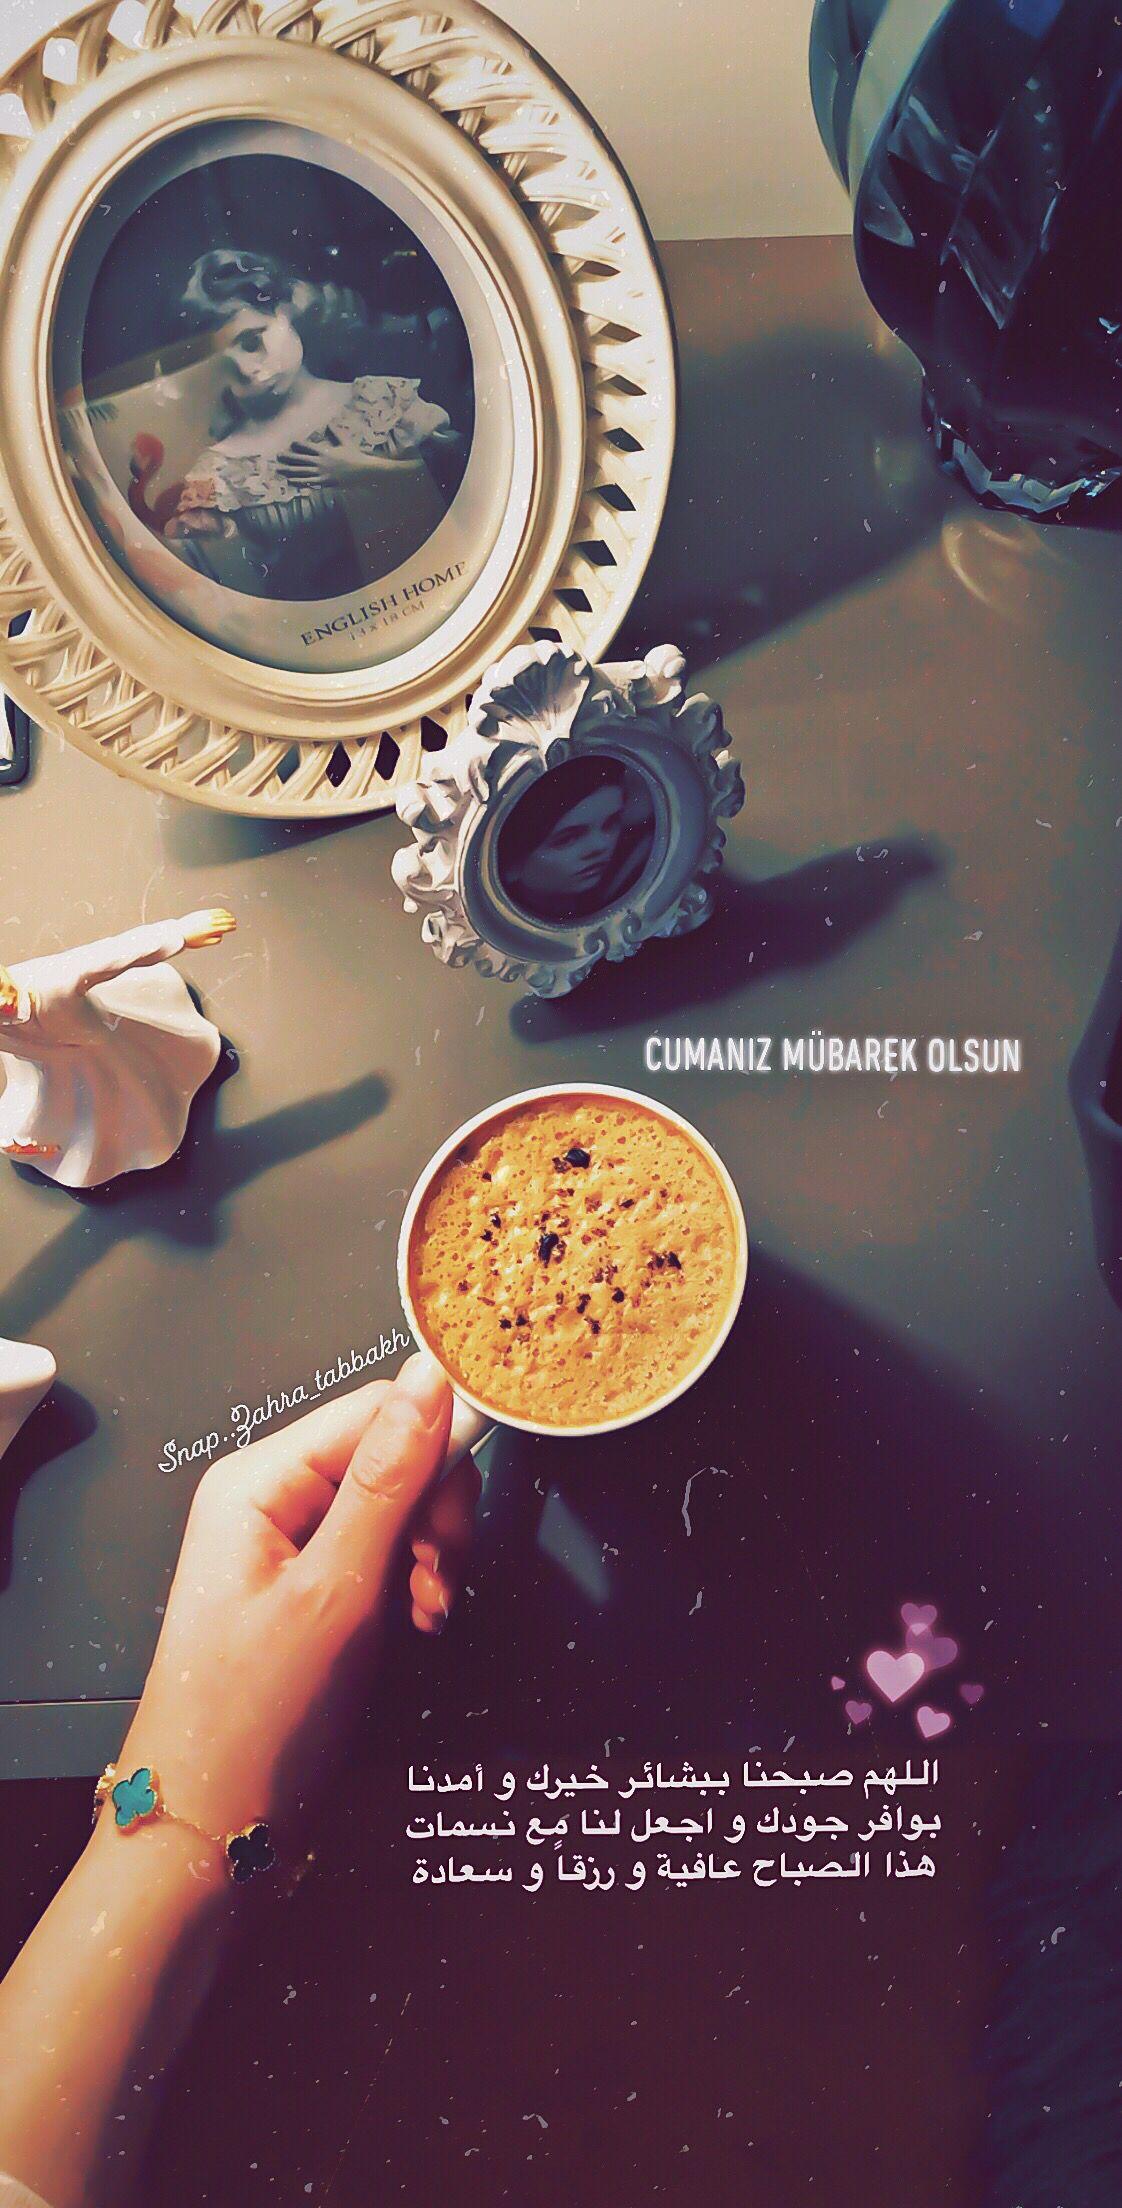 Cumaniz Mubarek Olsun Good Day Quotes Good Morning Coffee Image Quotes